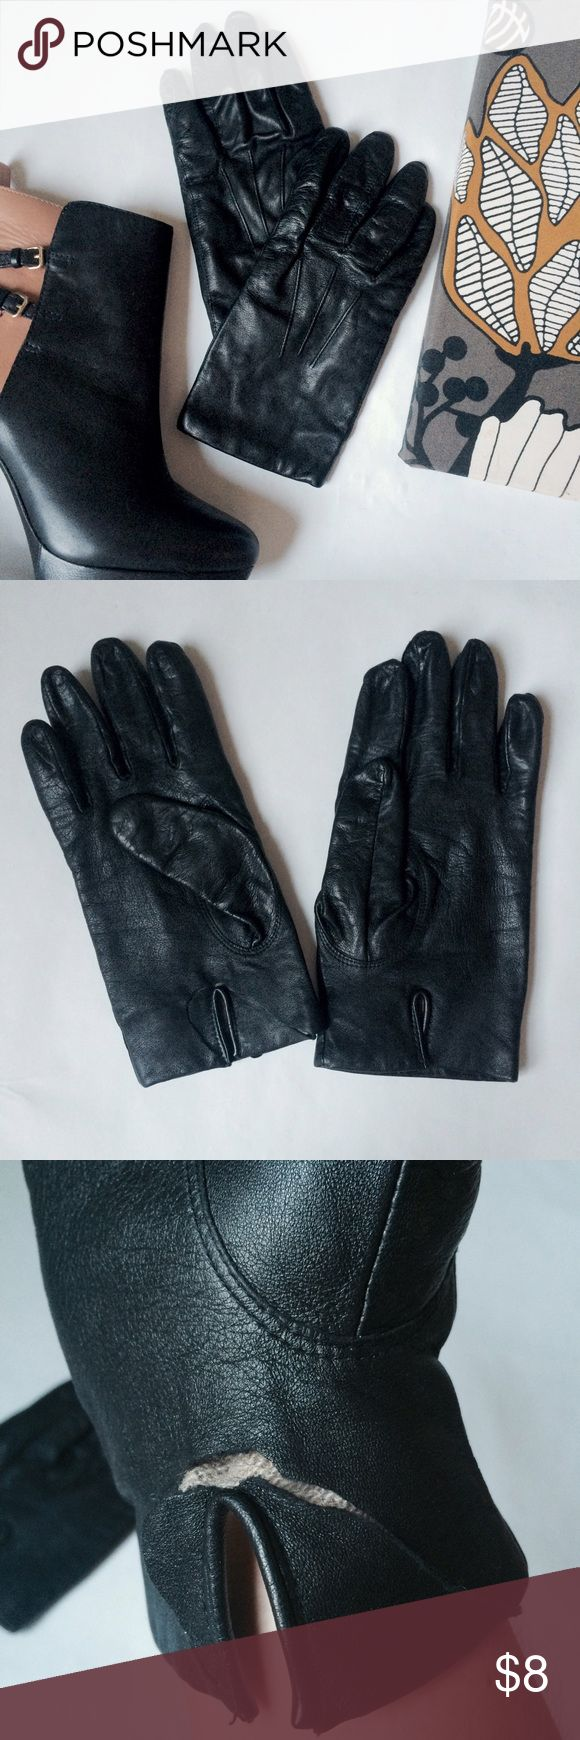 Black leather uniform gloves - Black Leather Gloves Has Tear Inner Wrist